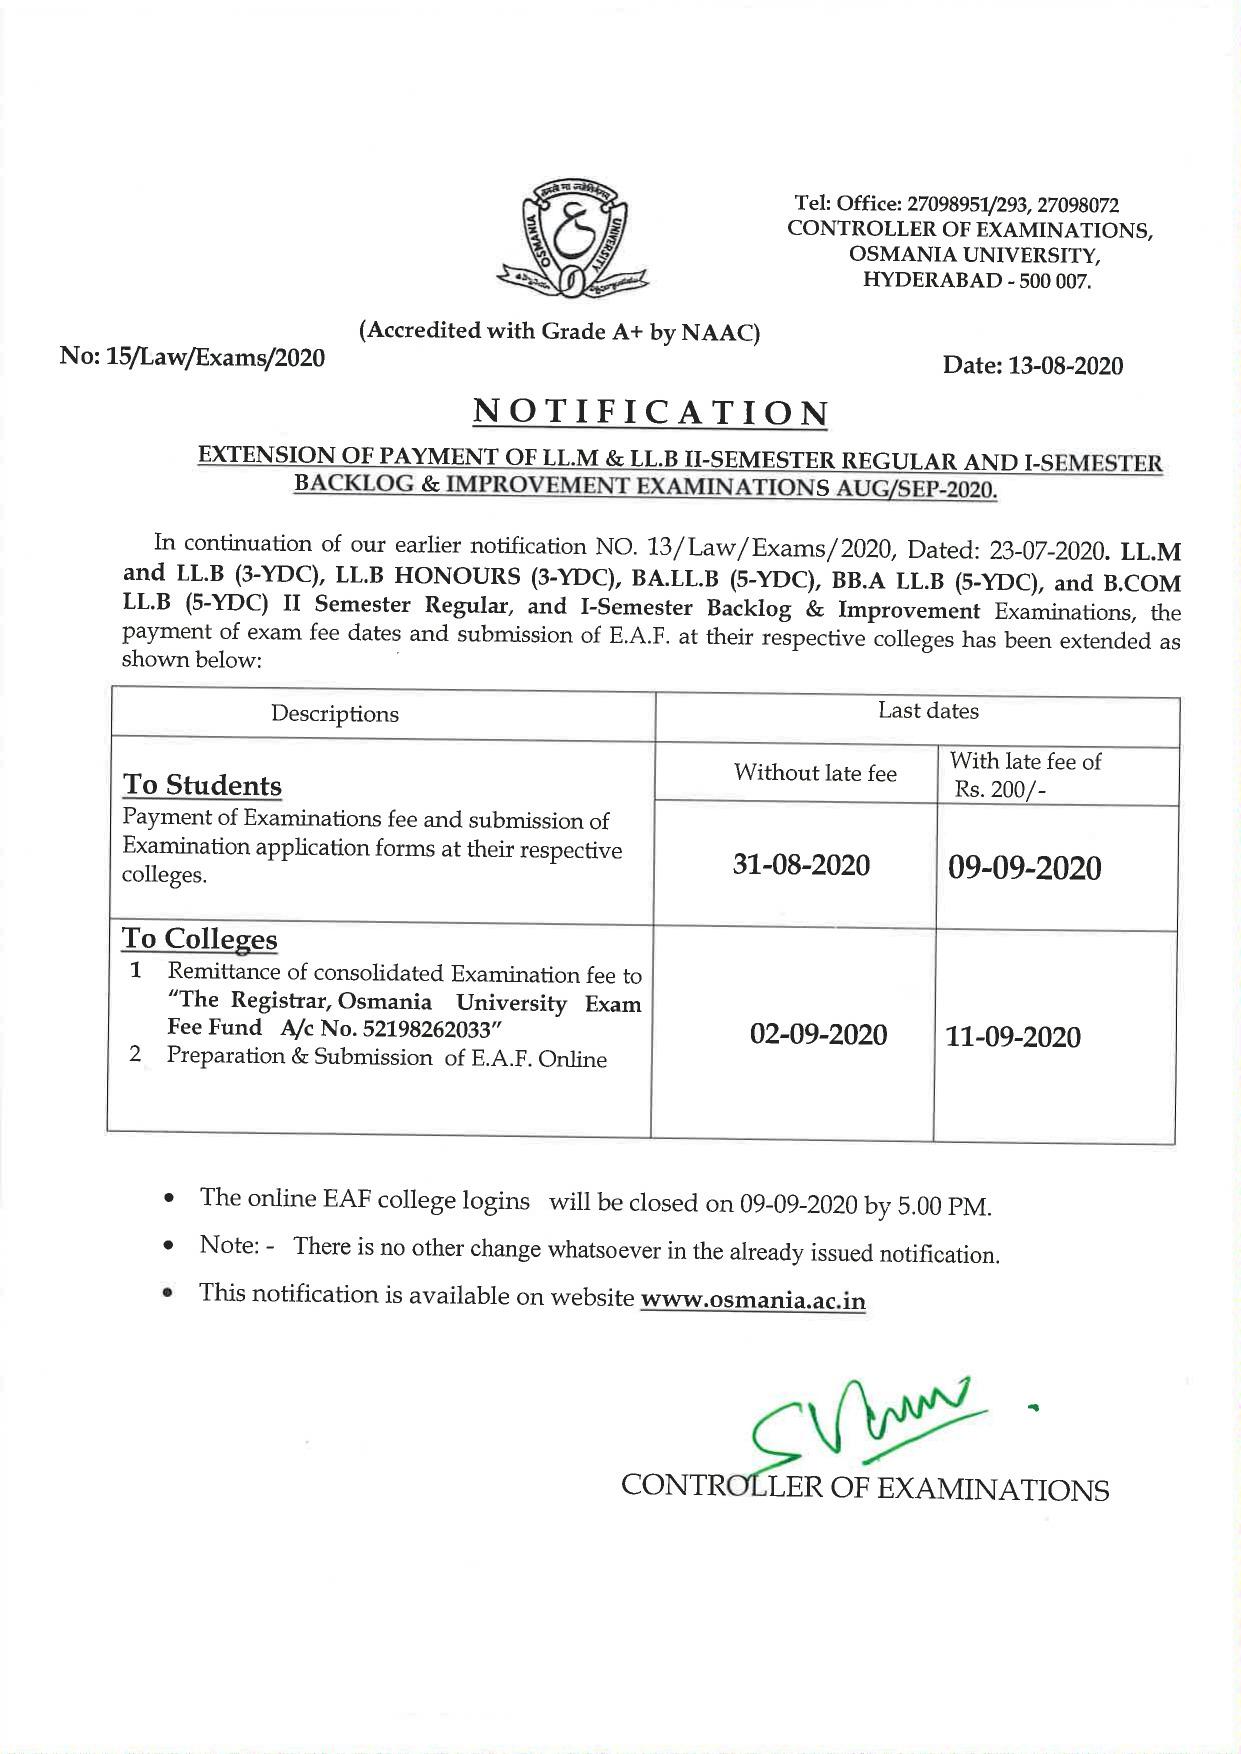 Osmania University LLM & LLB 1st & 2nd Sem August 2020 Exam Fee Extension Notification